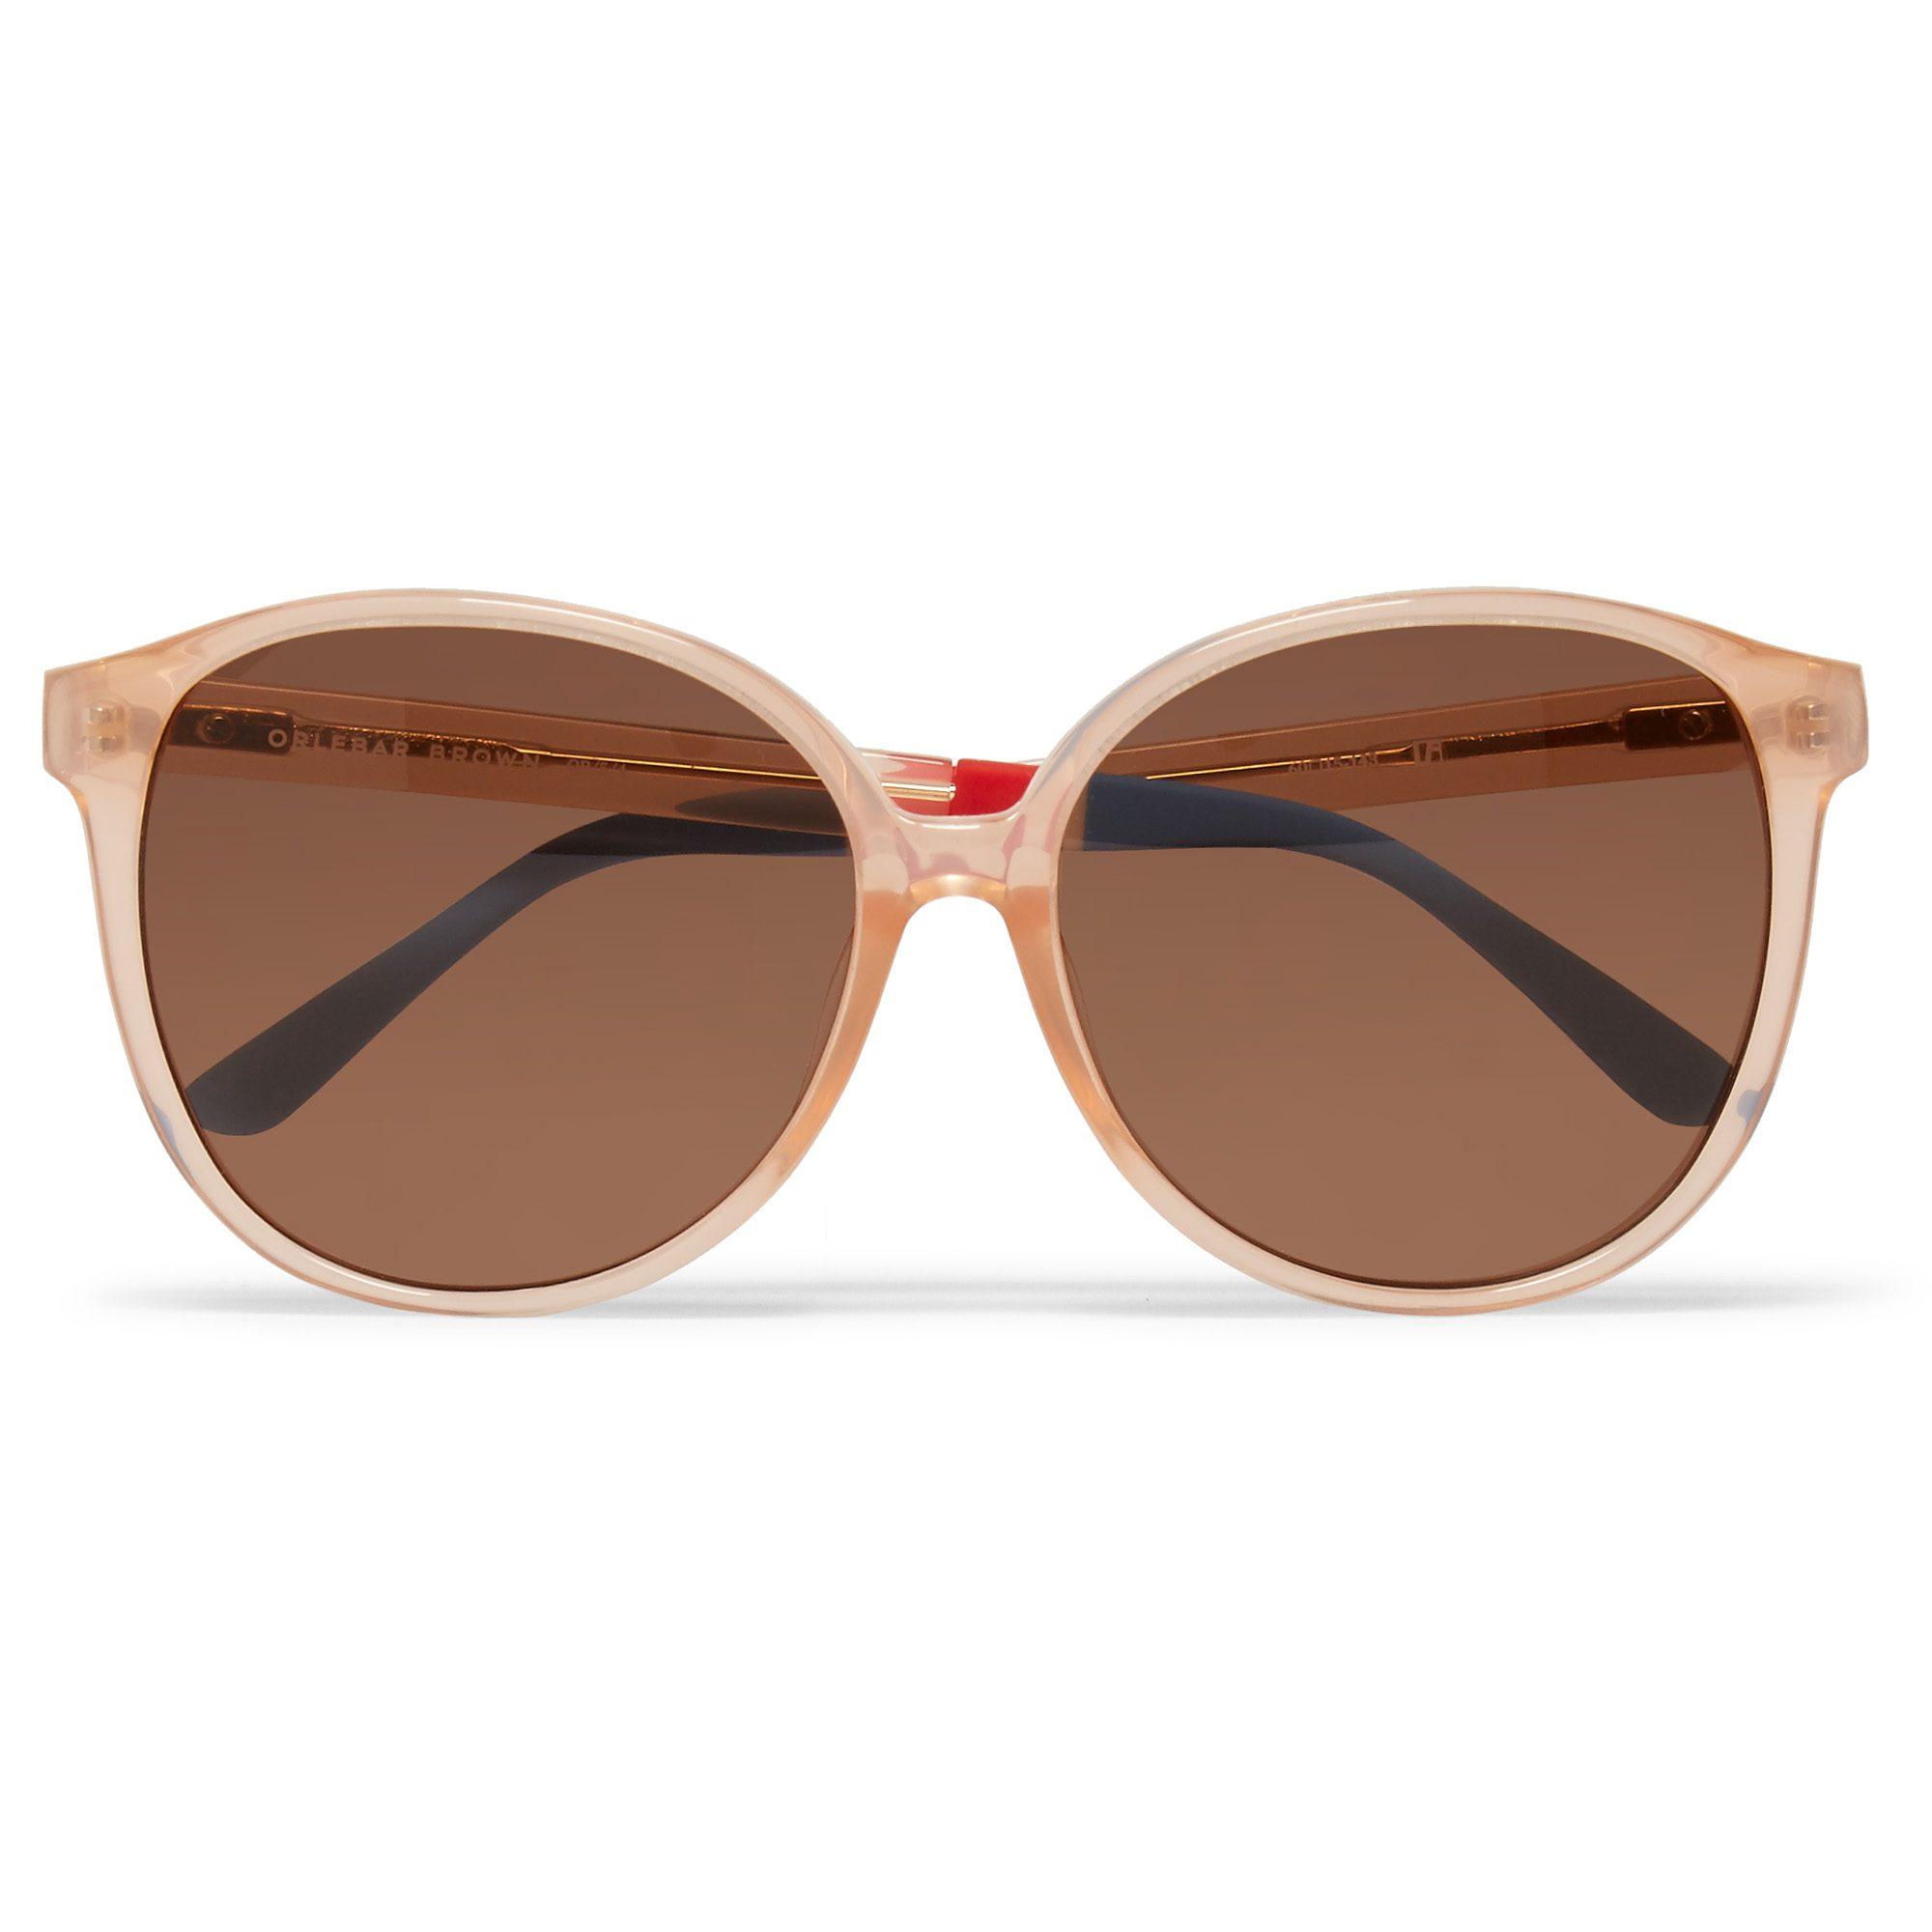 Orlebar-Brown-Spring-2016-Sunglasses_QUINN_OB5C4SUN_SUN BLUSH_TAWNY BROWN_RIVIERA.jpg